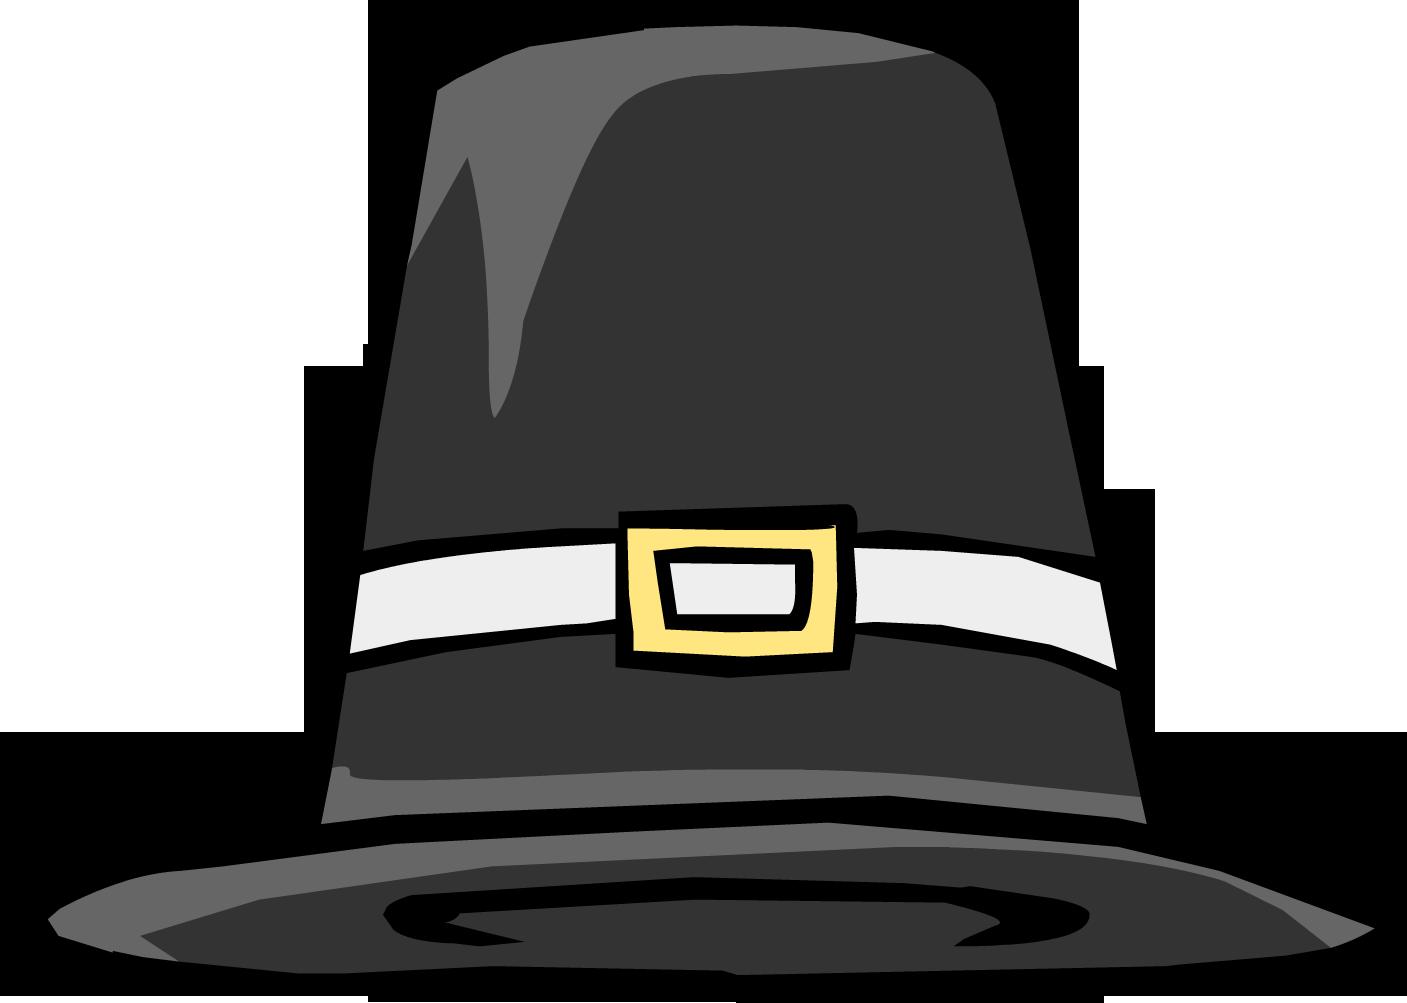 Clipart penquin hat clipart.  collection of penguin